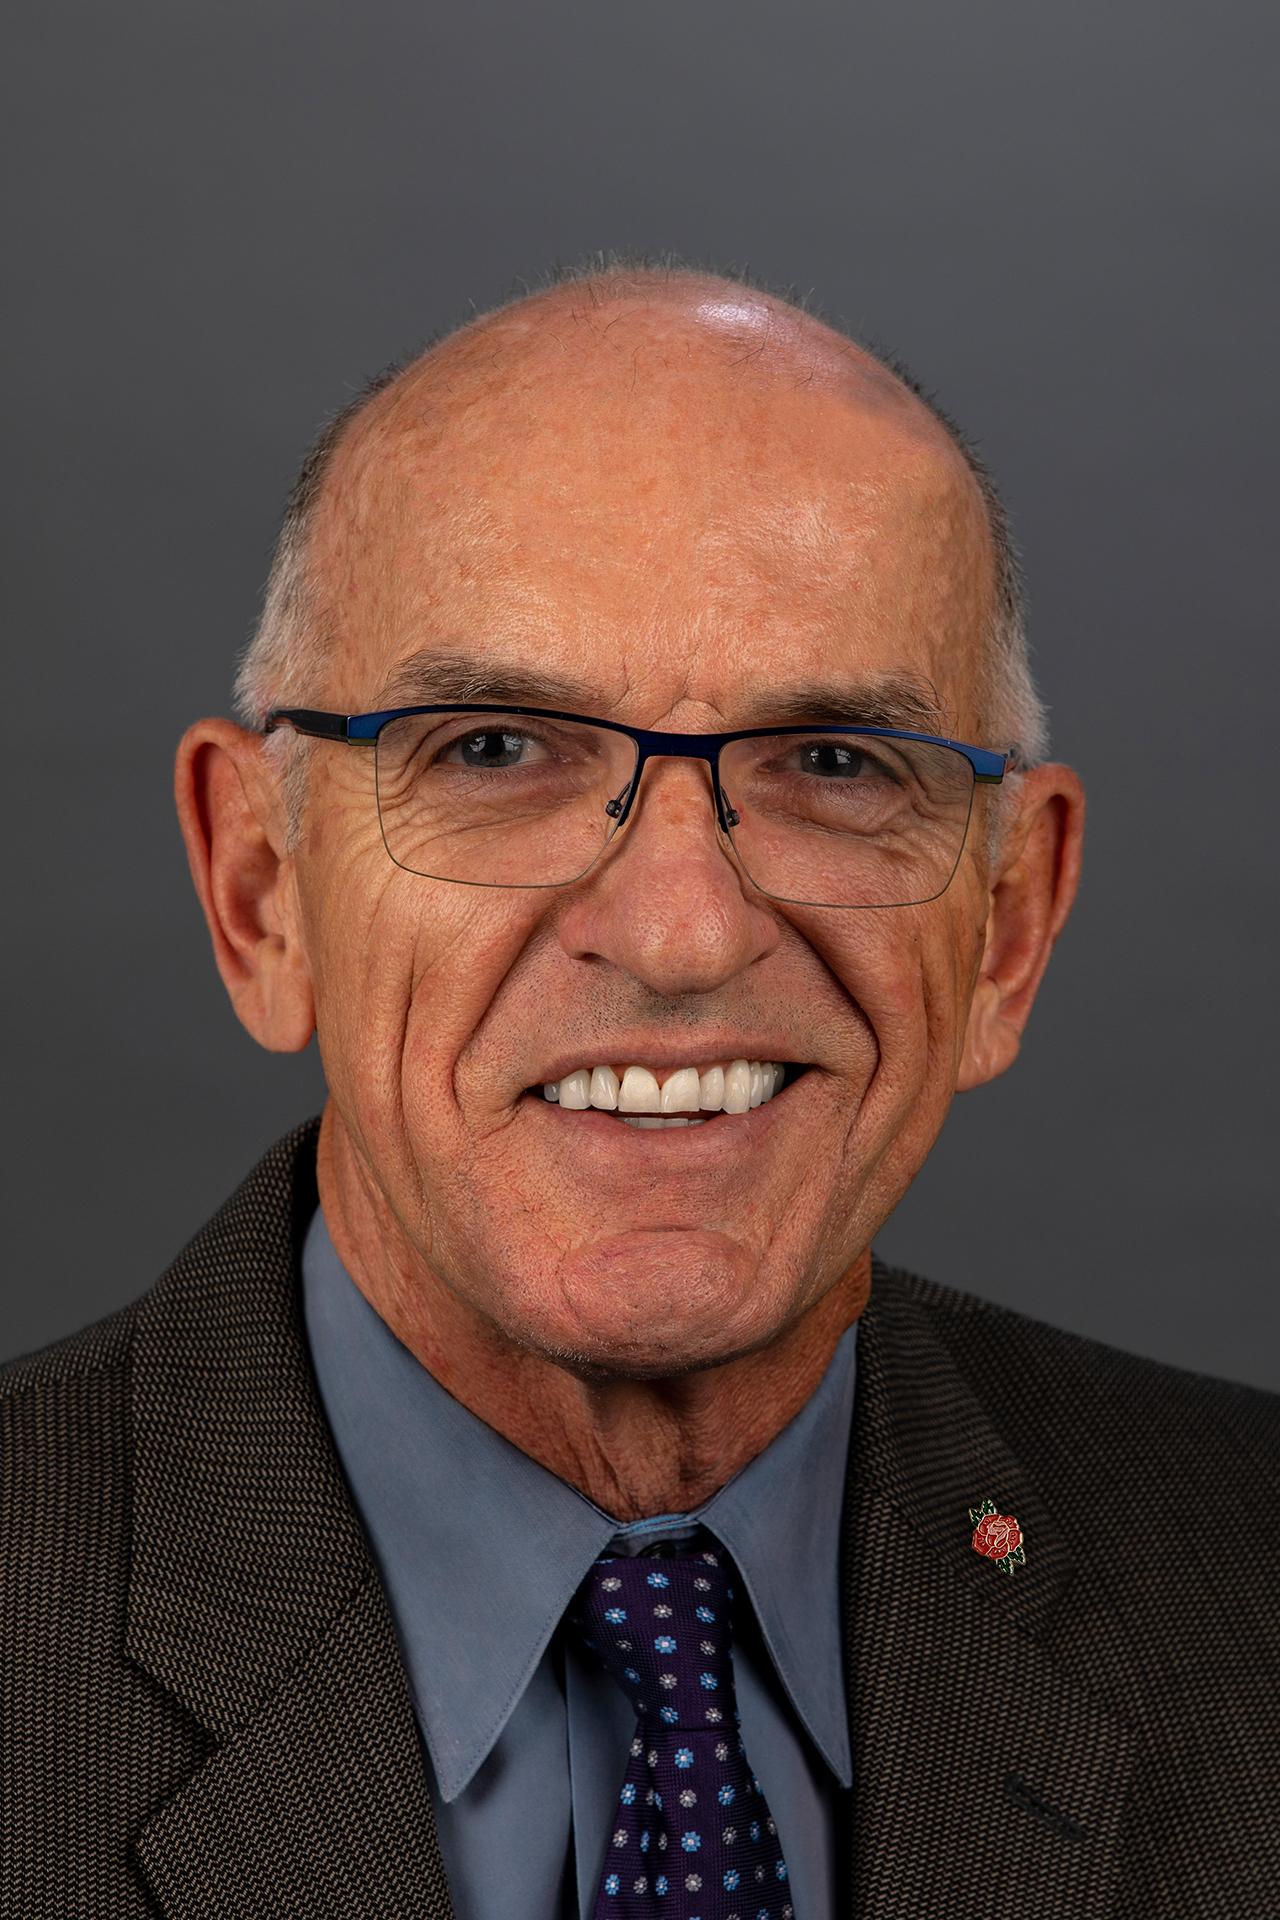 Portrait of Chris Spicher